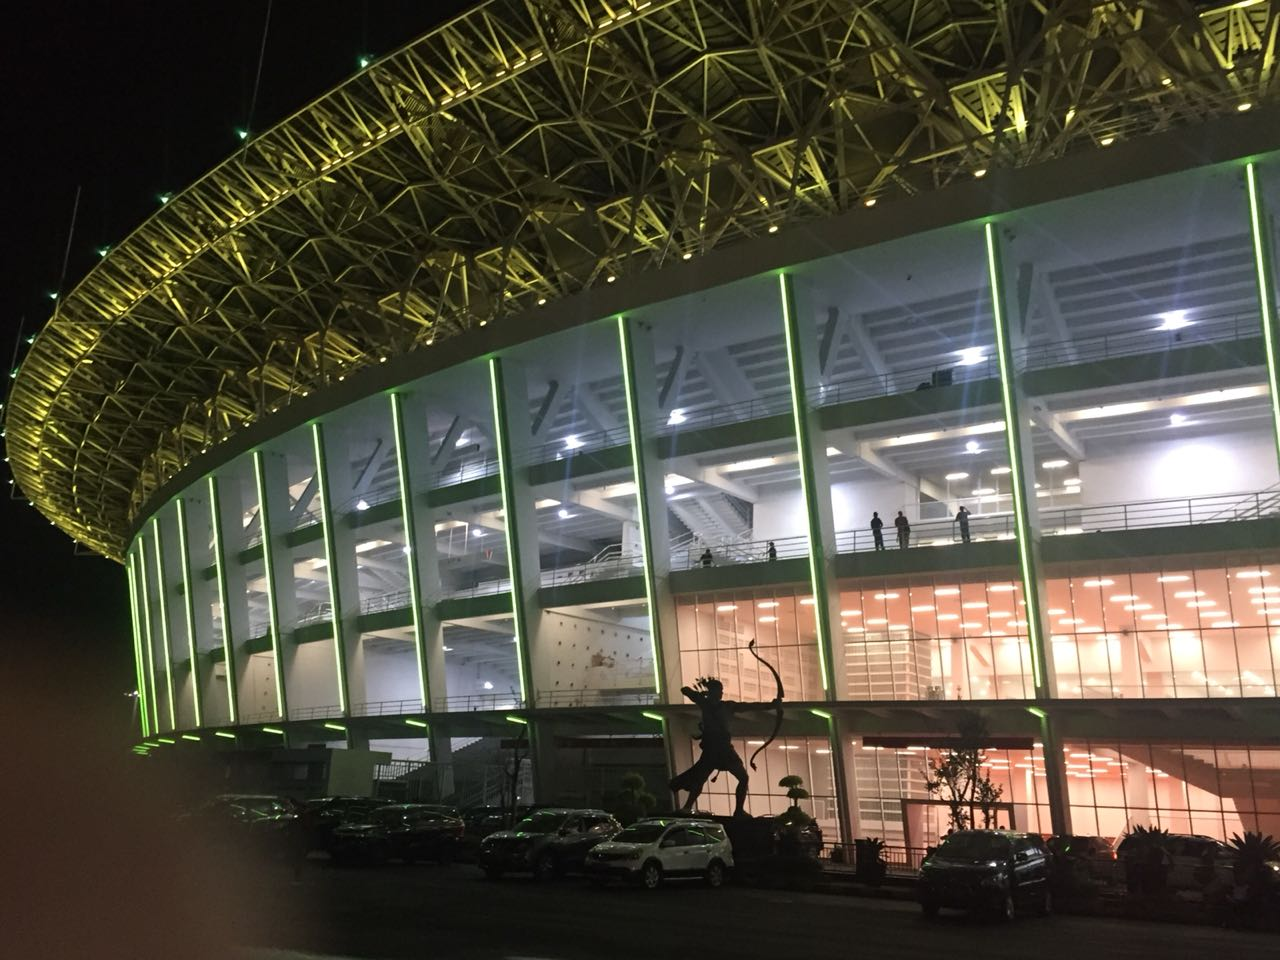 https: img.okeinfo.net content 2018 01 12 470 1844348 stadion-gelora-bung-karno-direnovasi-warga-jakarta-harus-merawatnya-fOEbwS4NML.jpg